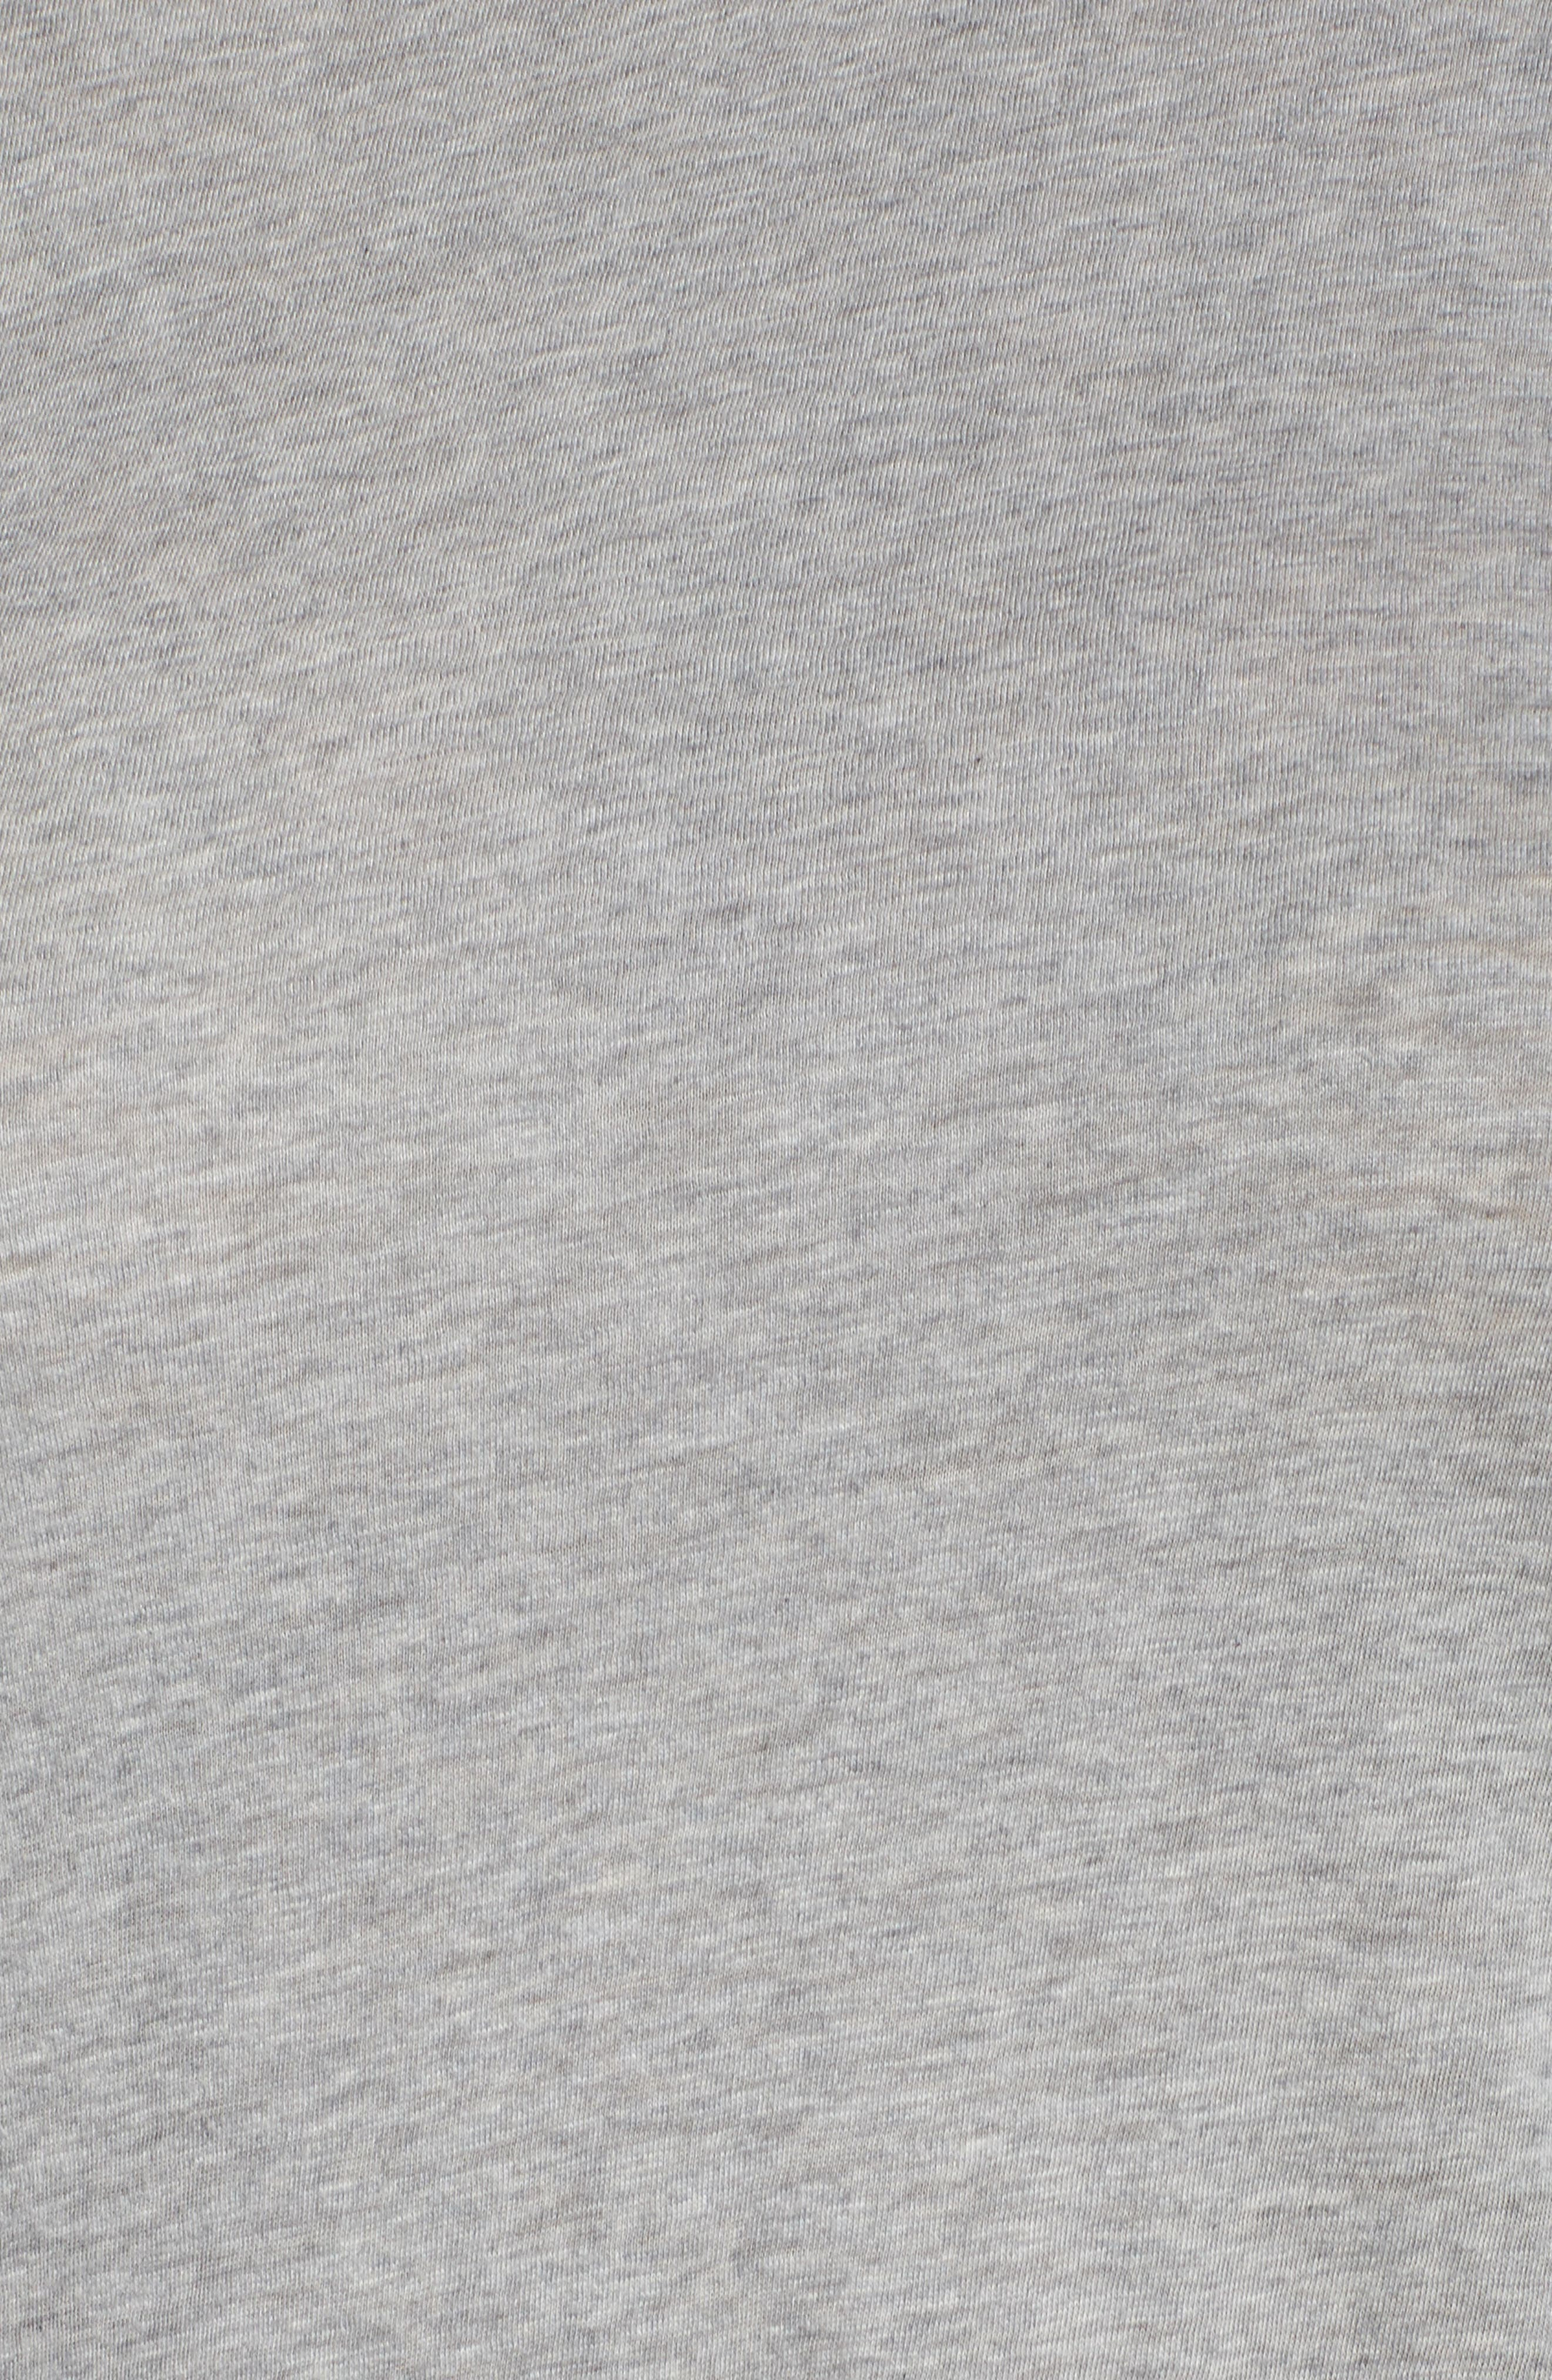 Long Sleeve Crewneck Tee,                             Alternate thumbnail 6, color,                             Grey Heather